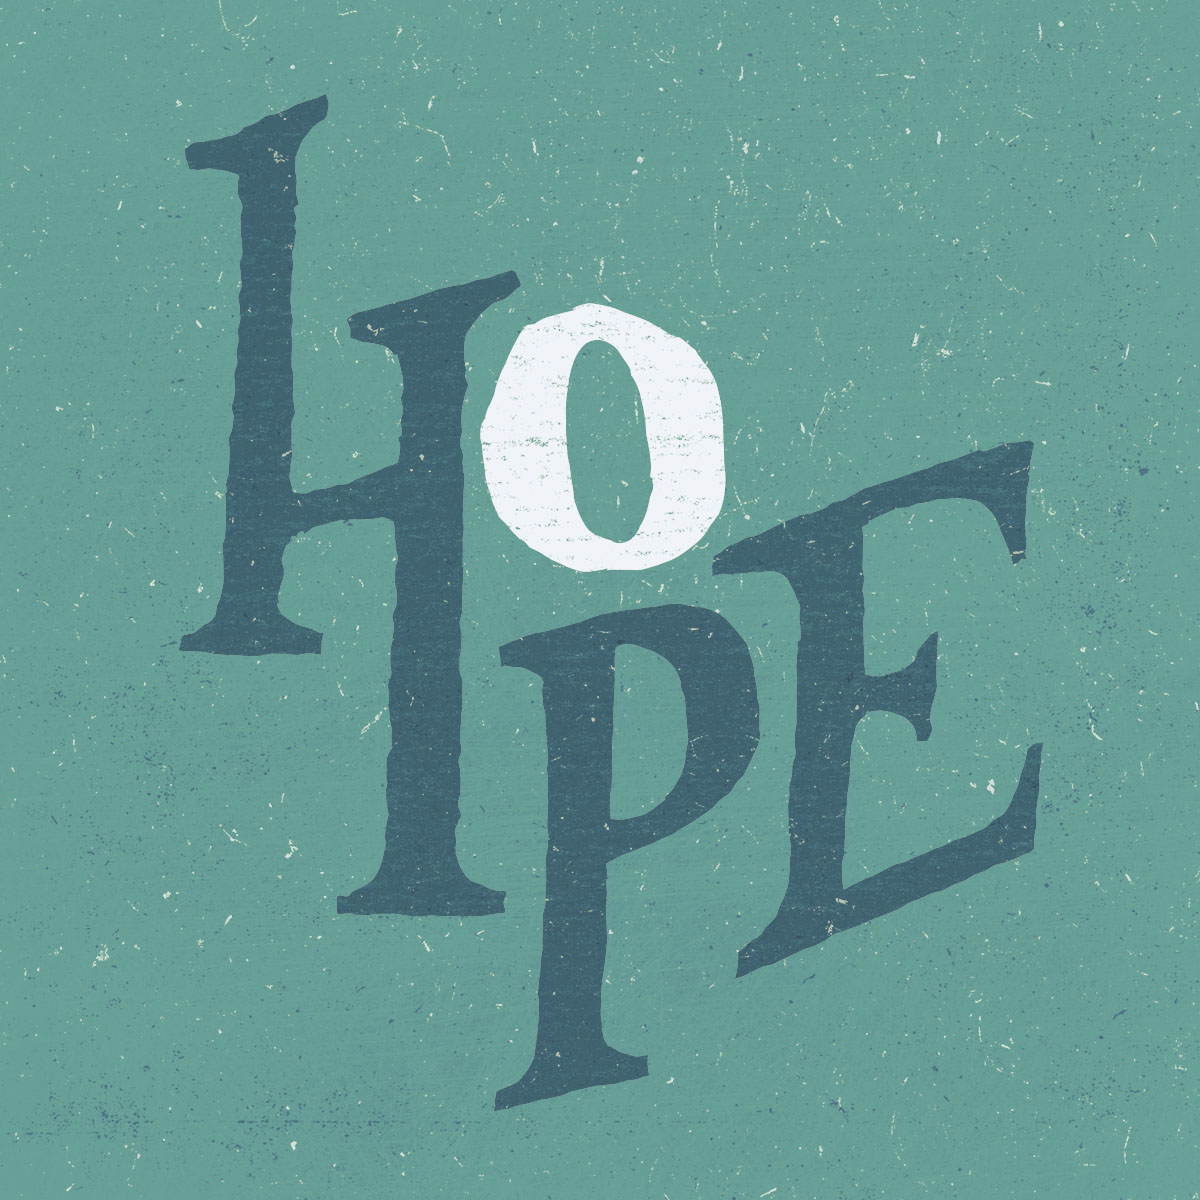 Hope-1_1x1_square.jpg